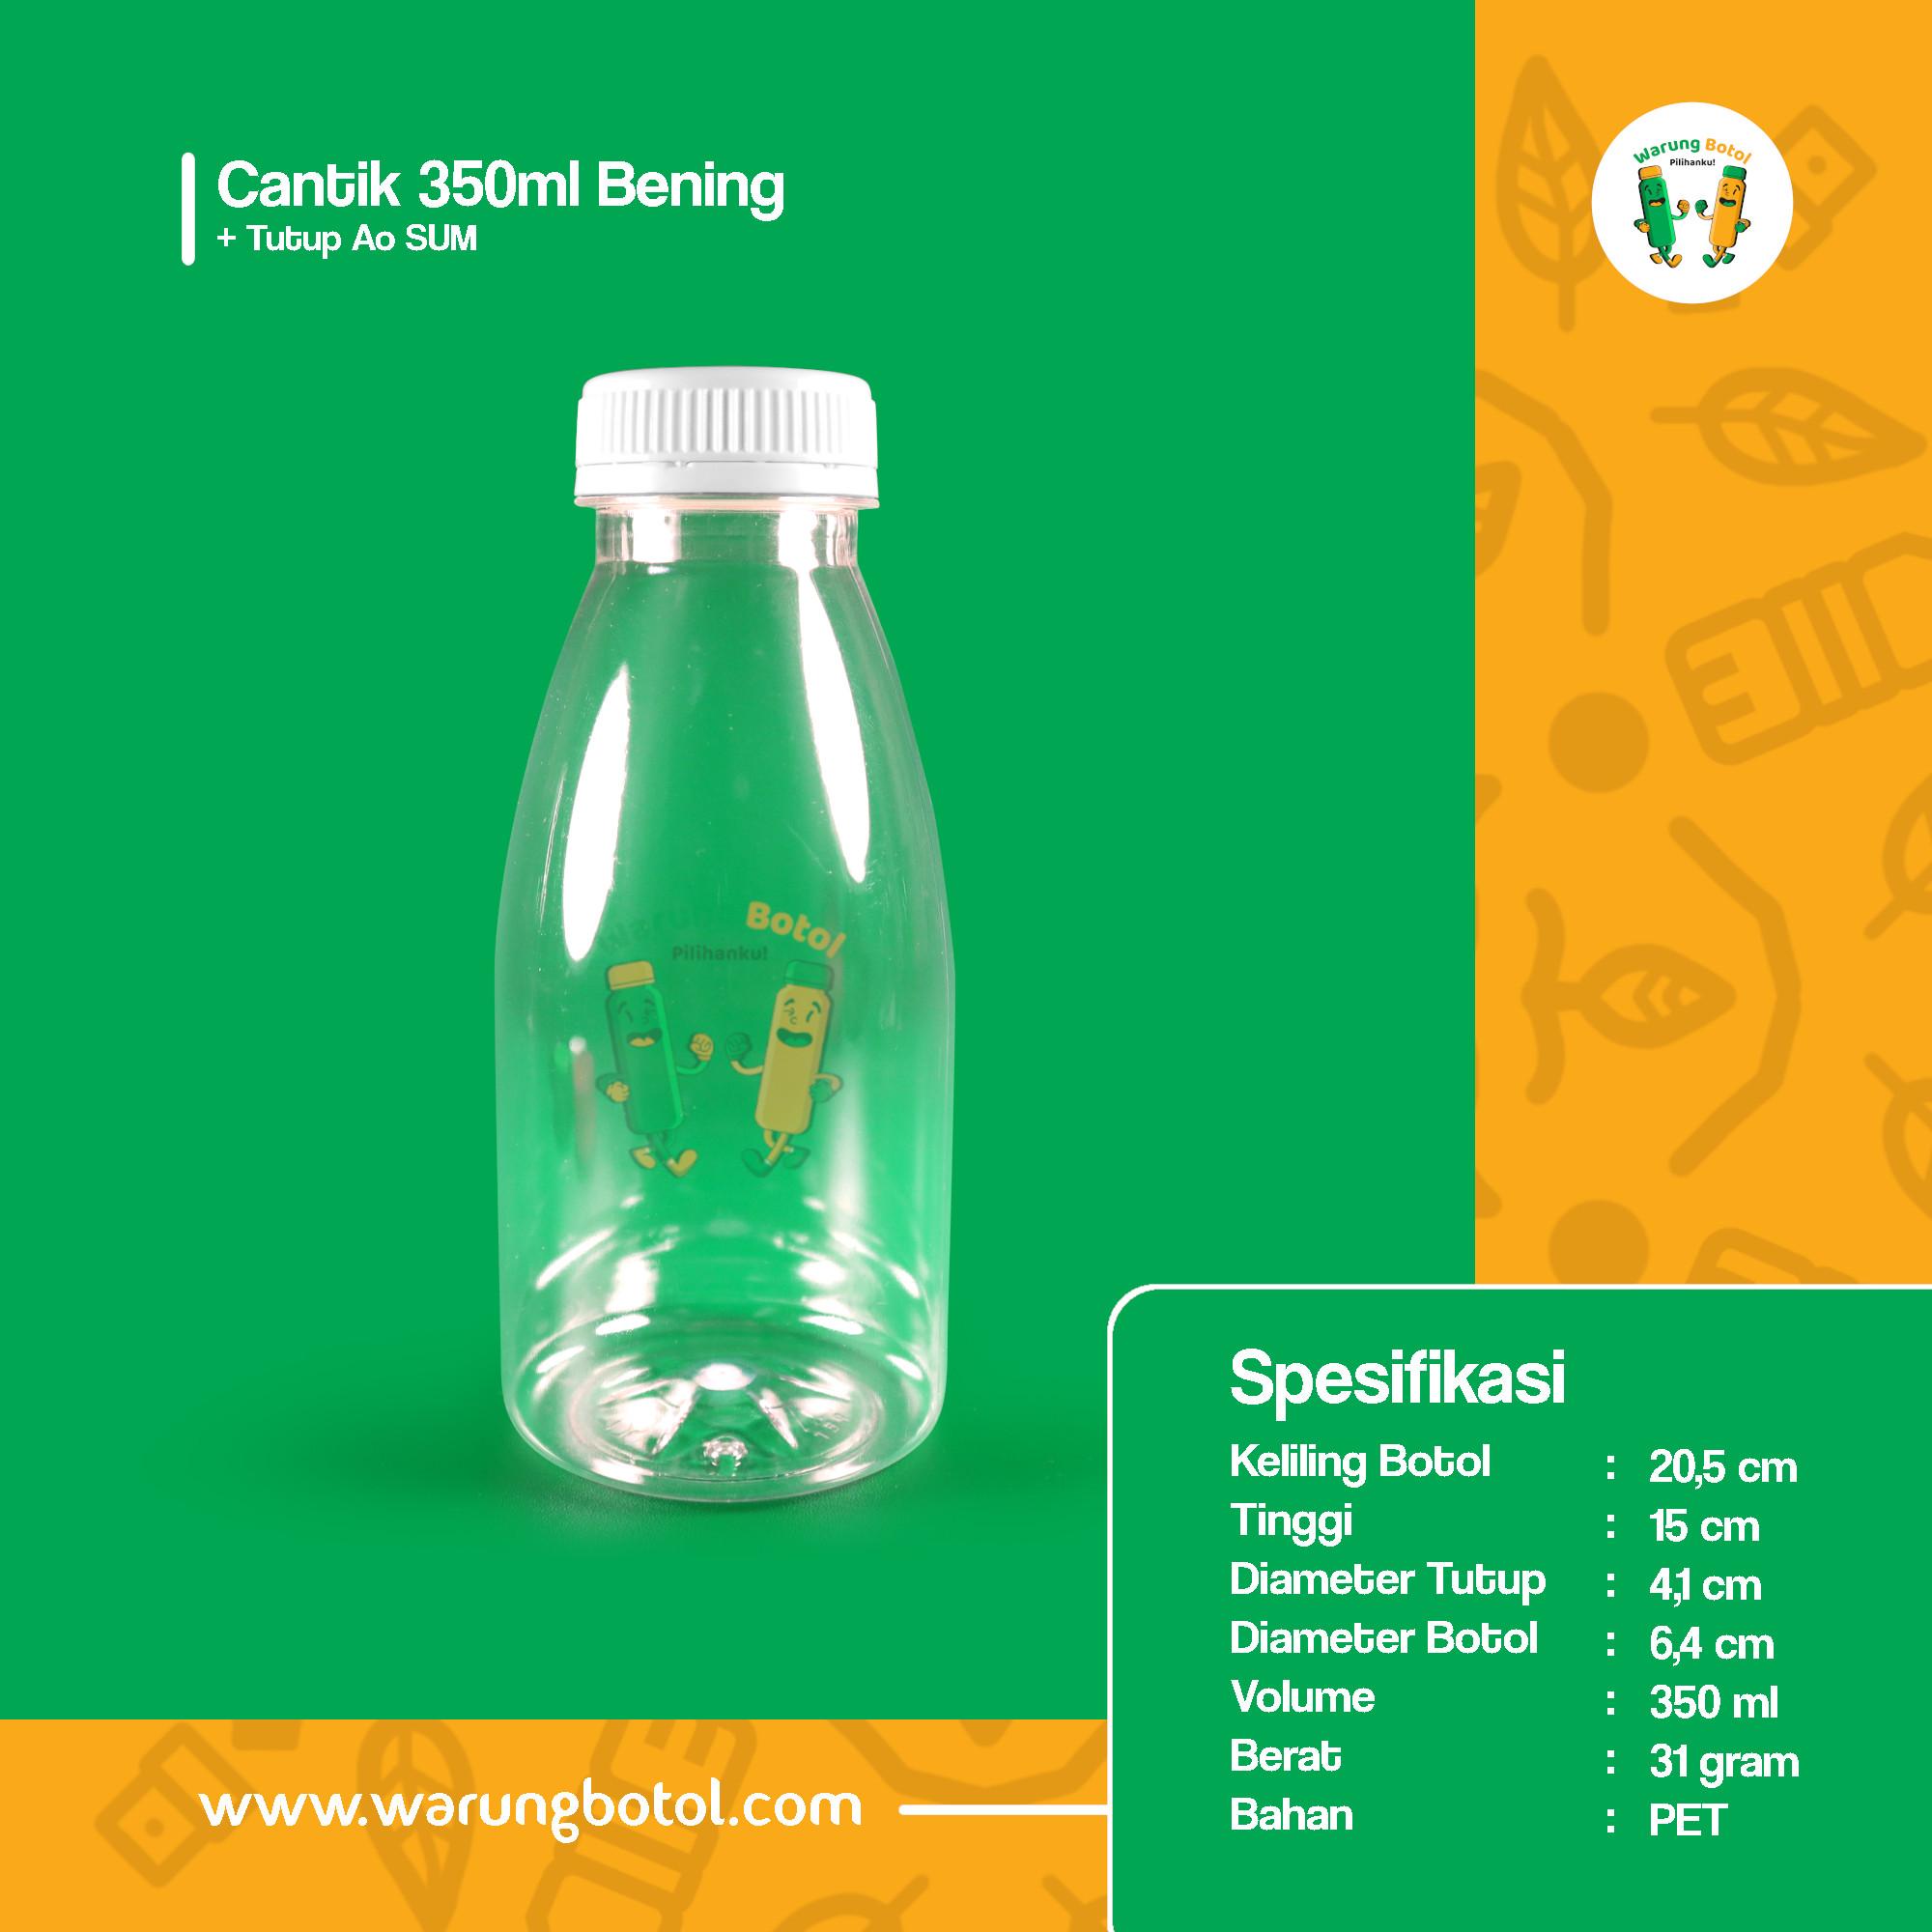 distributor toko jual botol plastik minuman unik 350ml bening murah terdekat bandung jakarta bogor bekasi